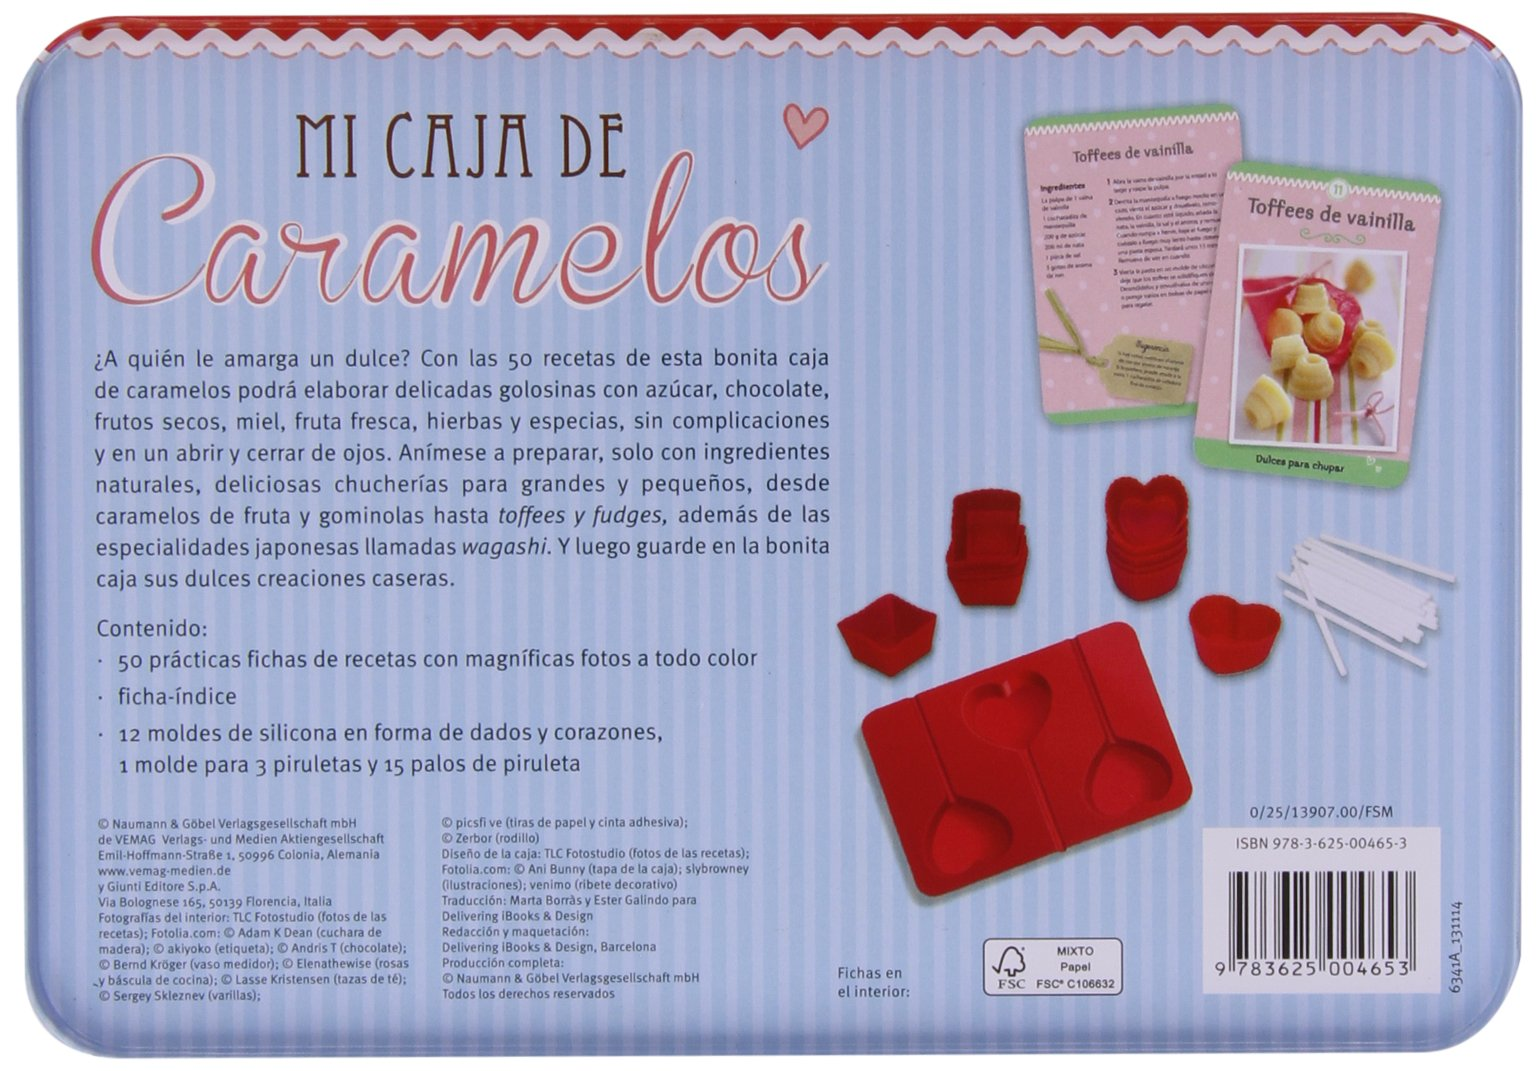 MI CAJA DE CARAMELOS - NGV: VARIOS(004653): 9783625004653: Amazon.com: Books